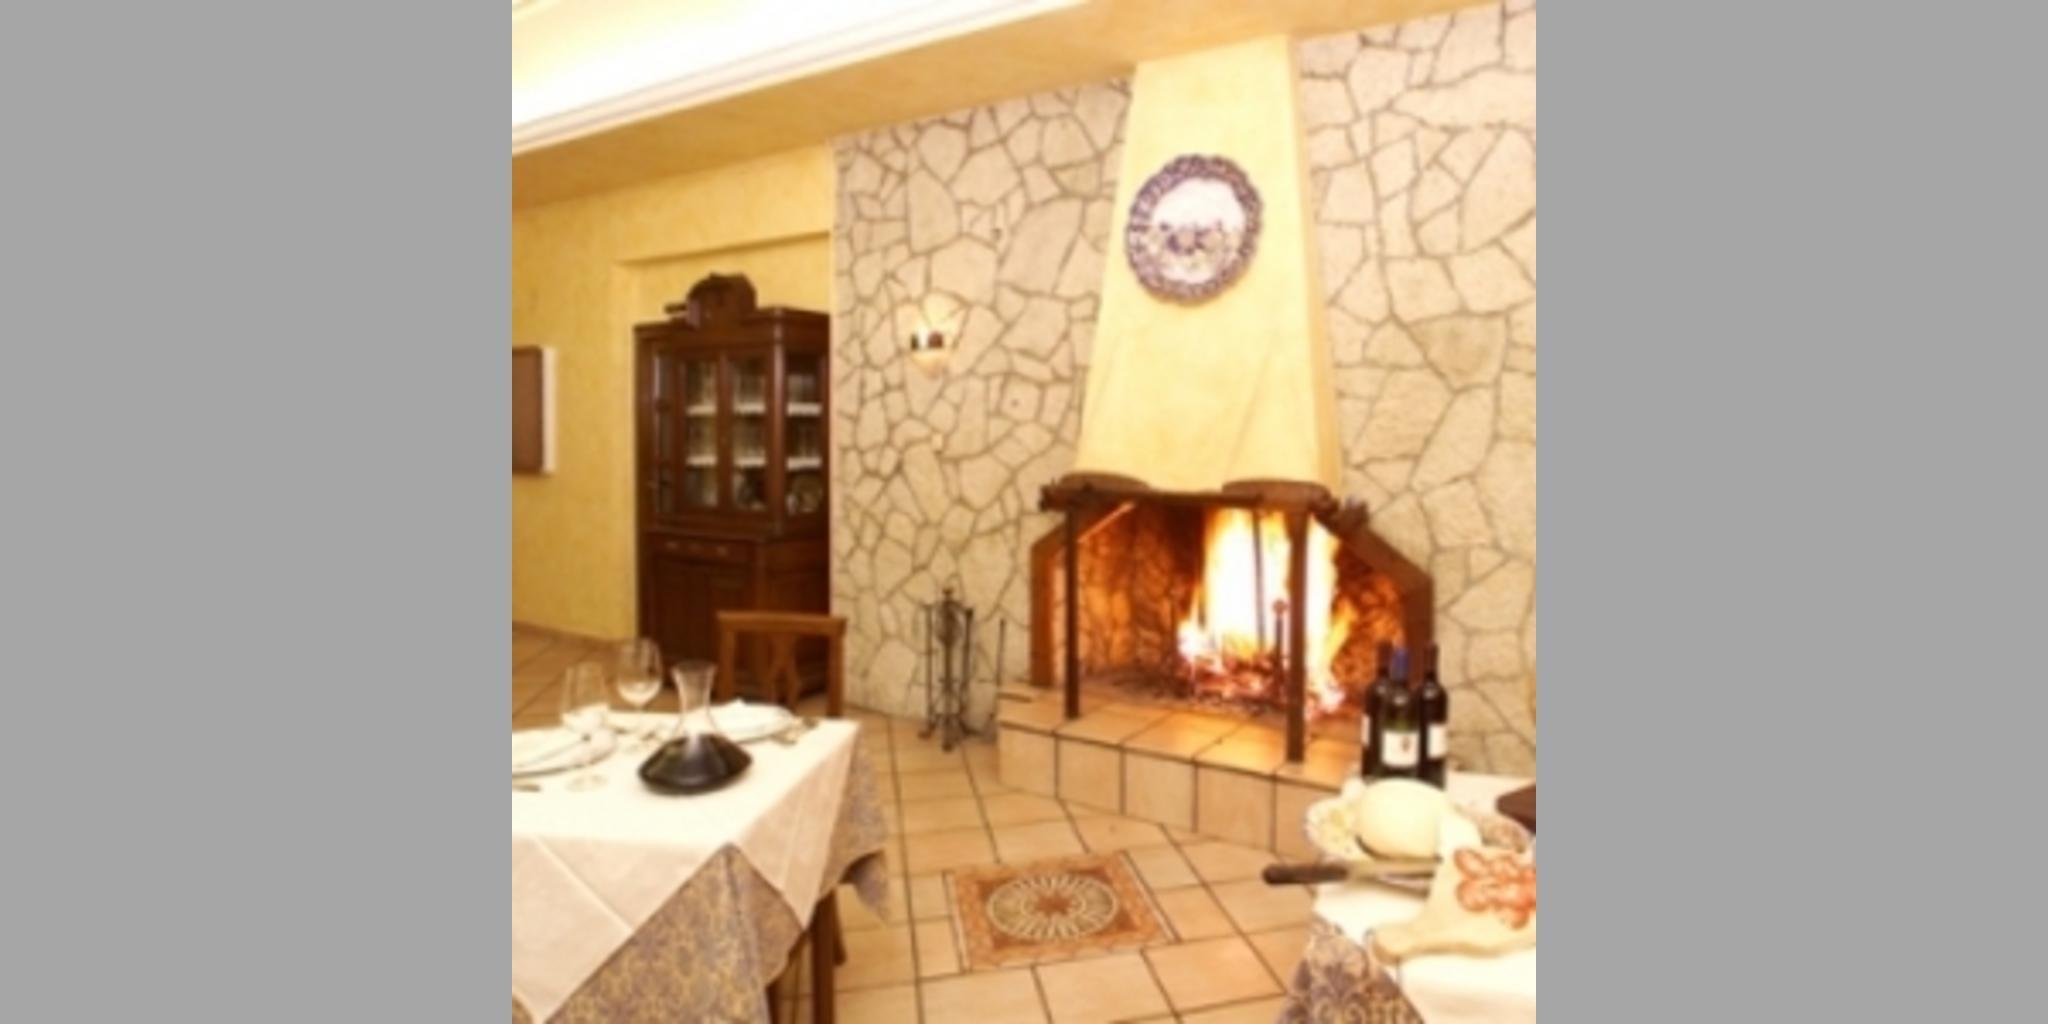 Hotel Fabriano - Campodonico